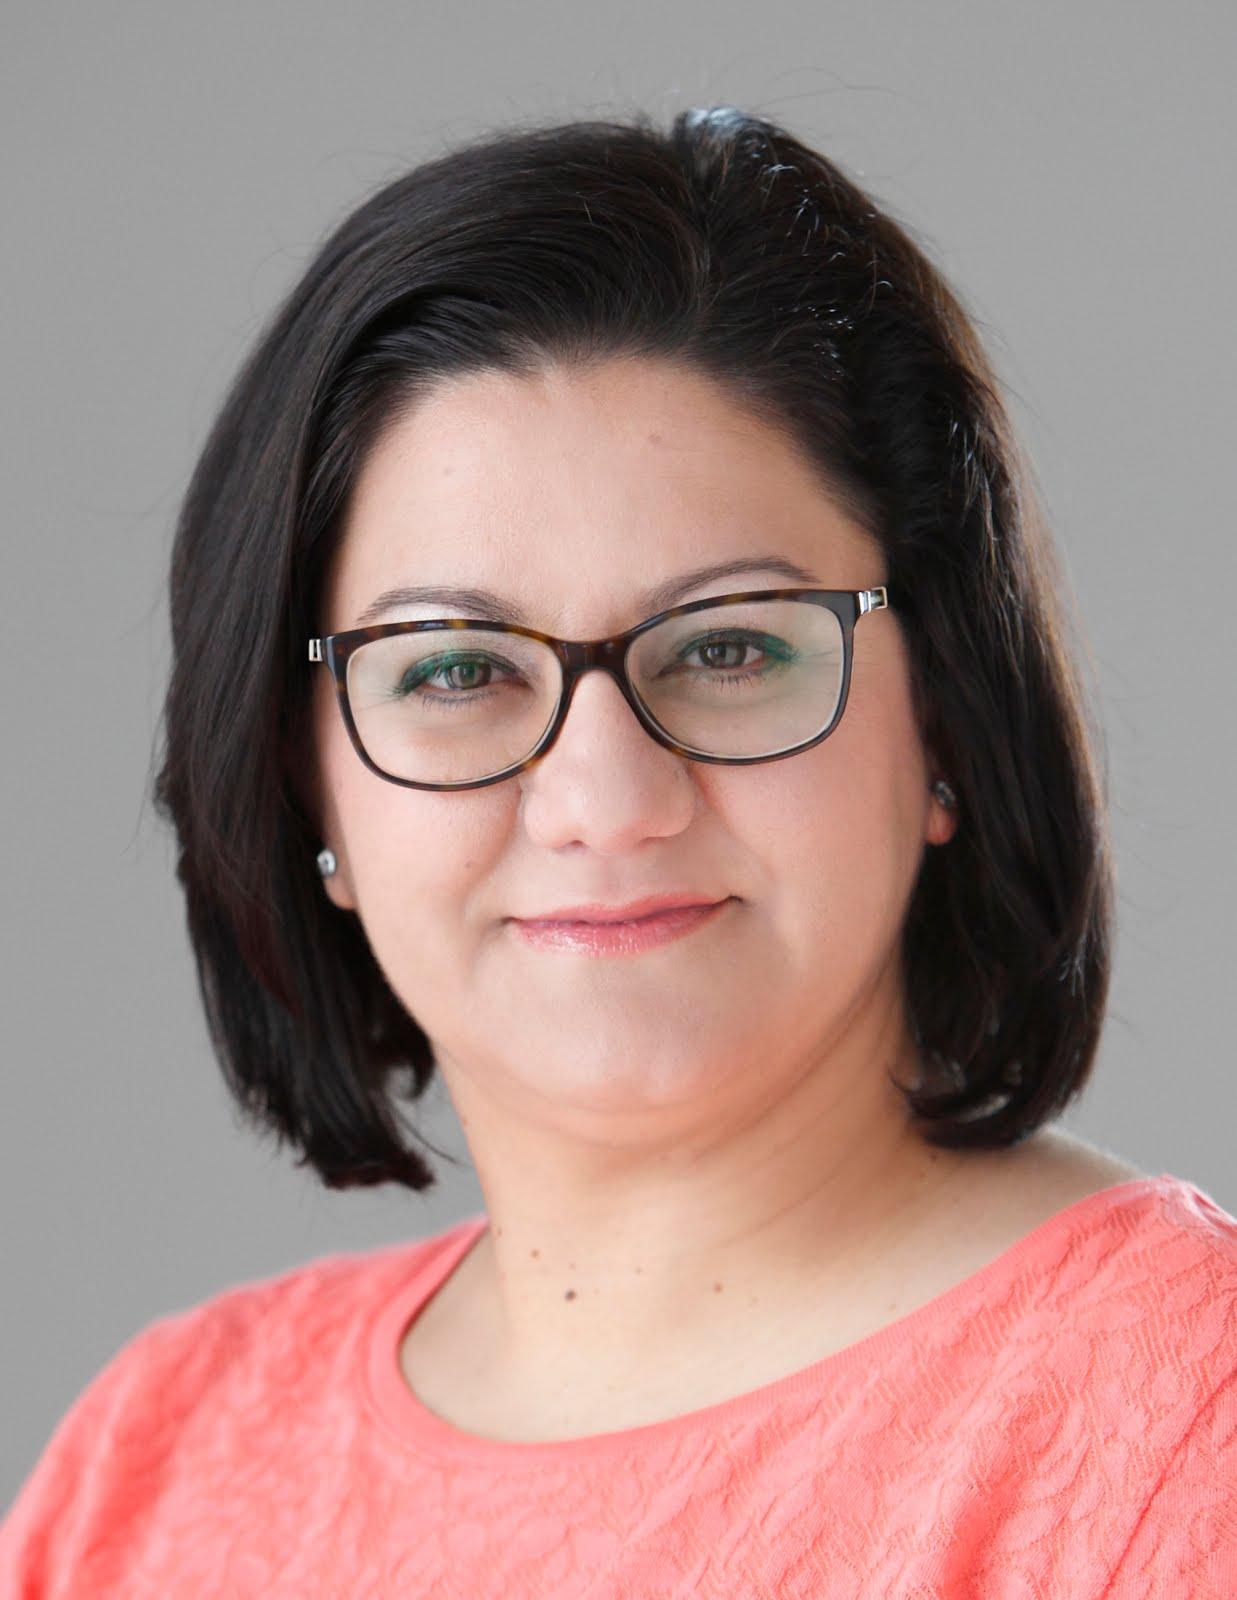 7. Yolanda Castaño López